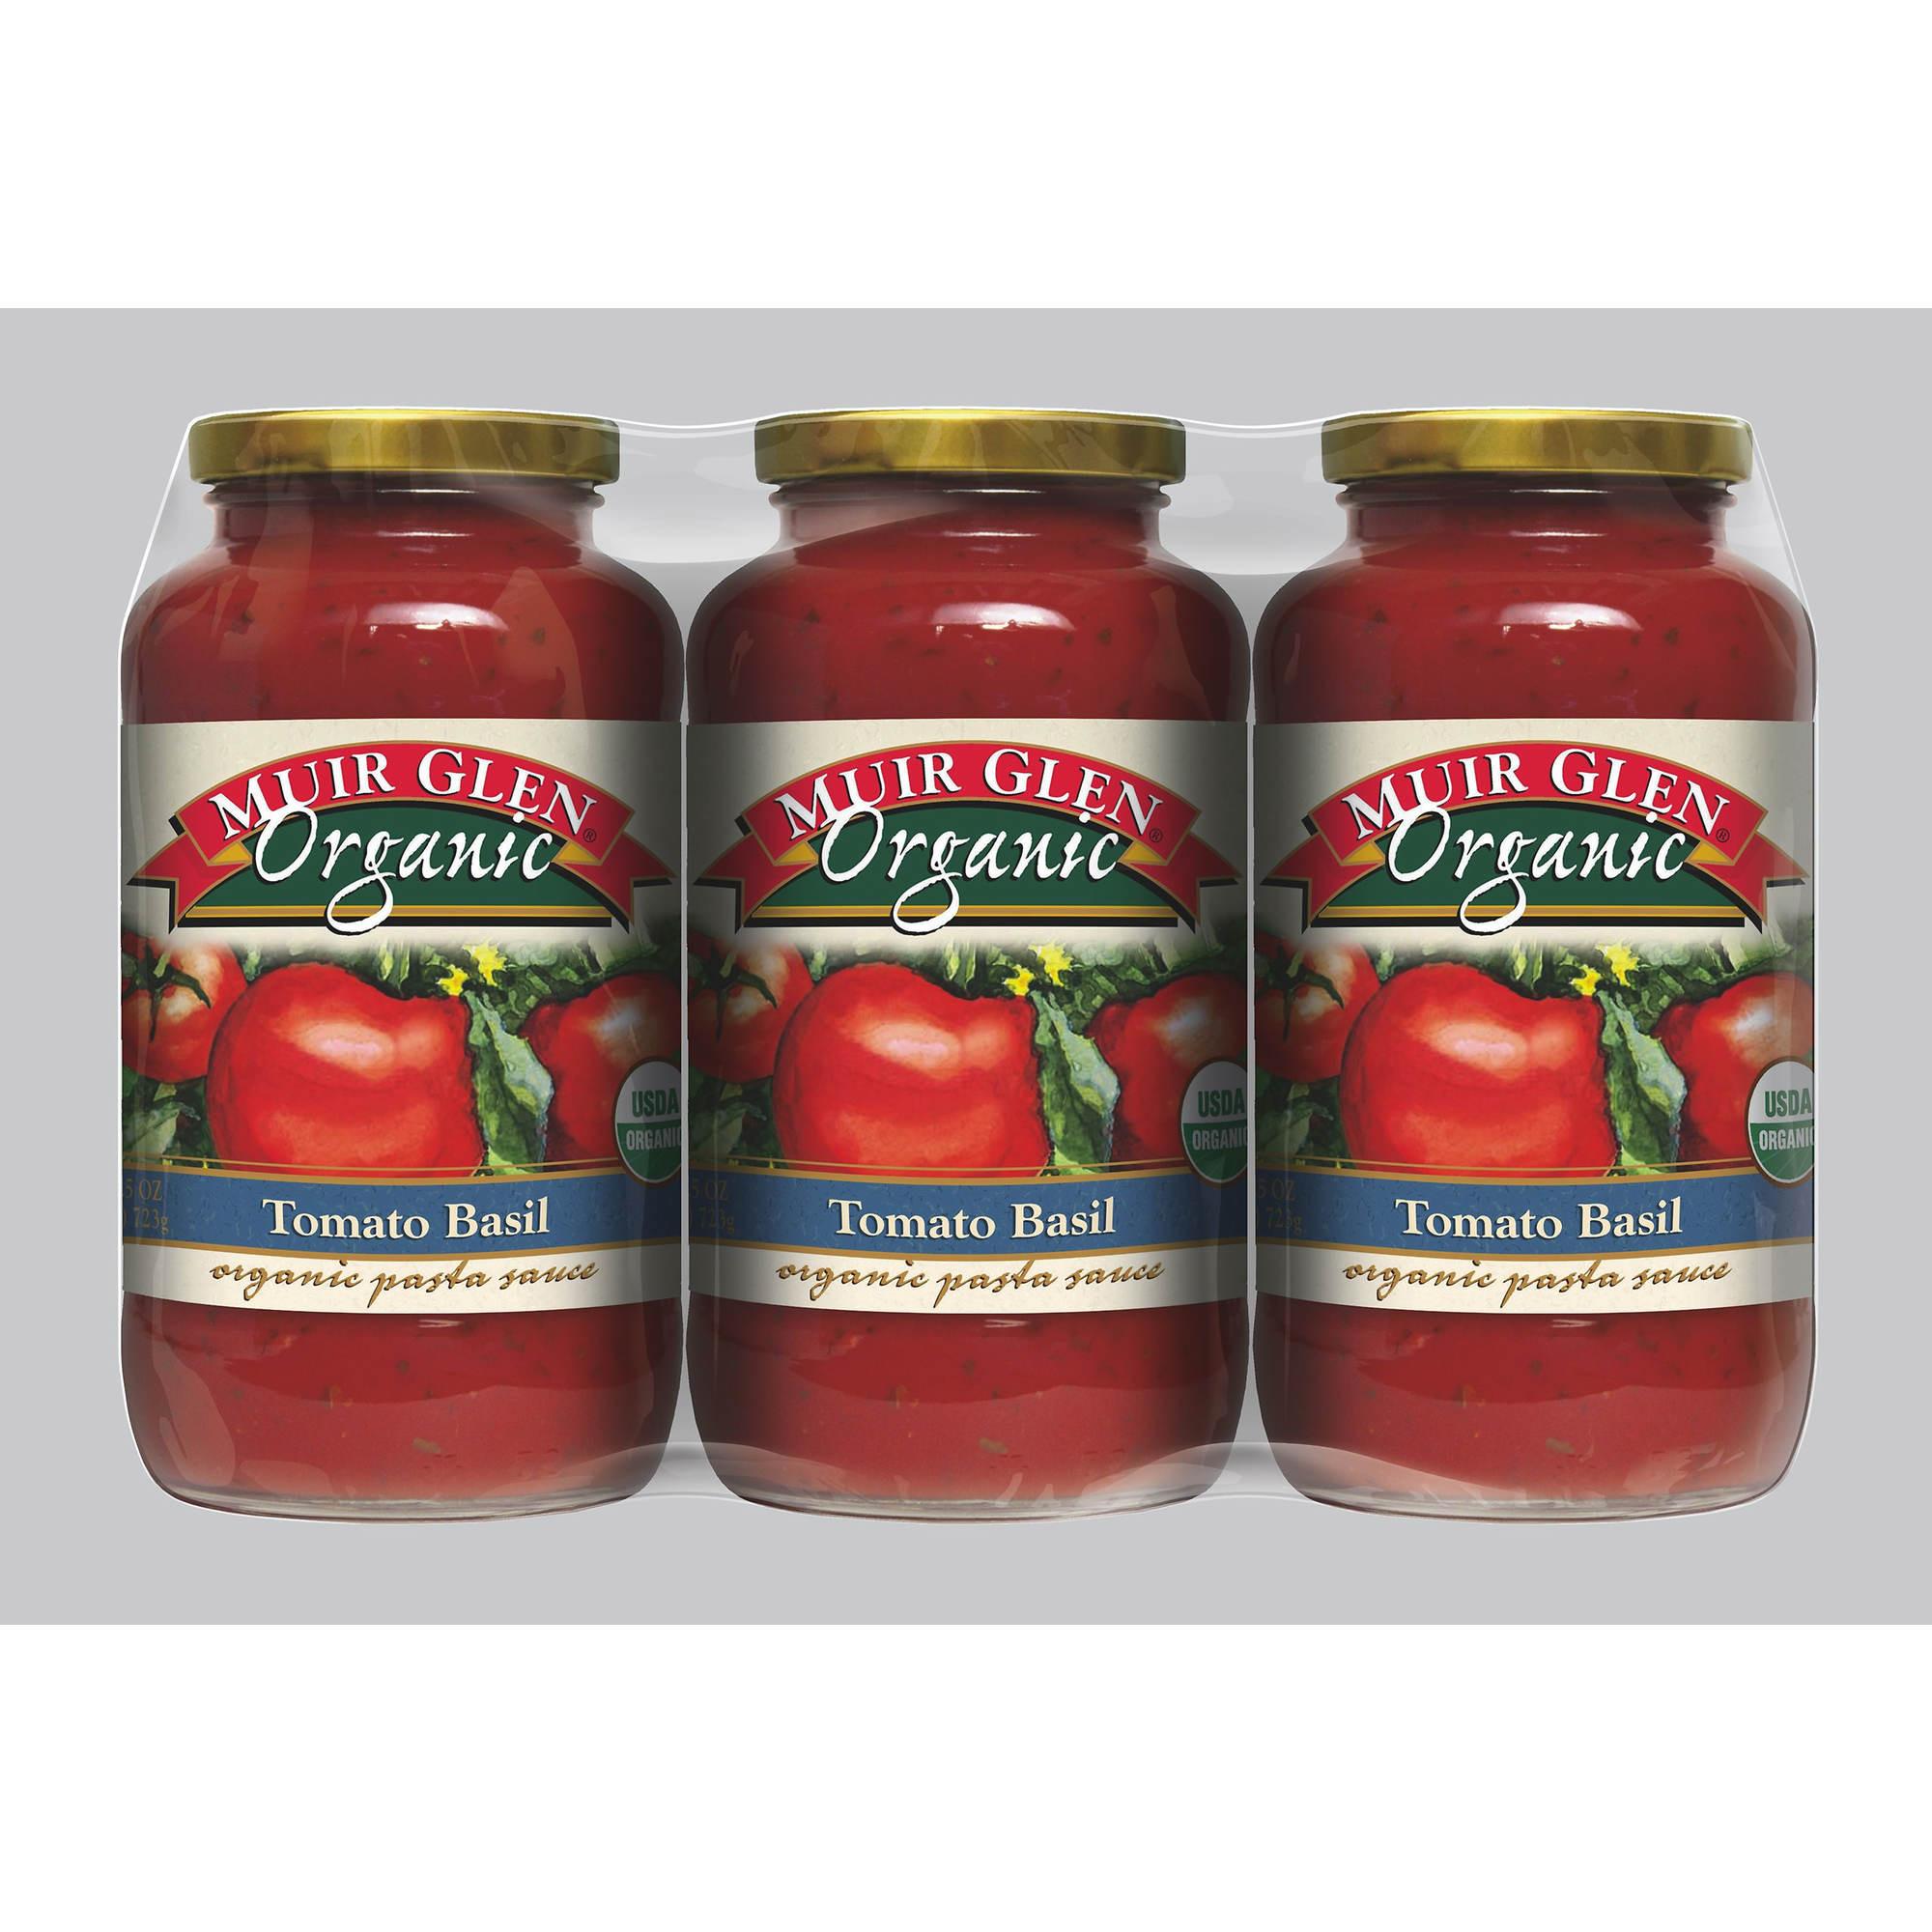 Muir Glen Tomato Sauce  Muir Glen Organic Tomato Basil Sauce 3 pk 8 5 oz BJ s